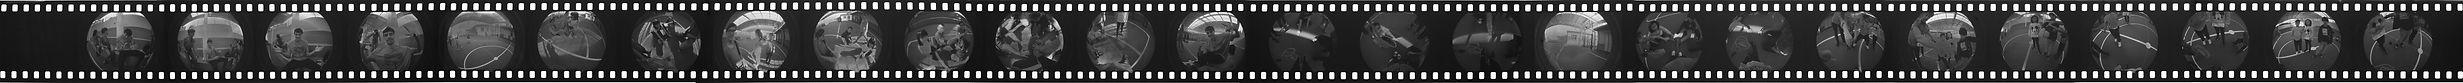 35mm_kid_2_class_NOFACE copy.jpg